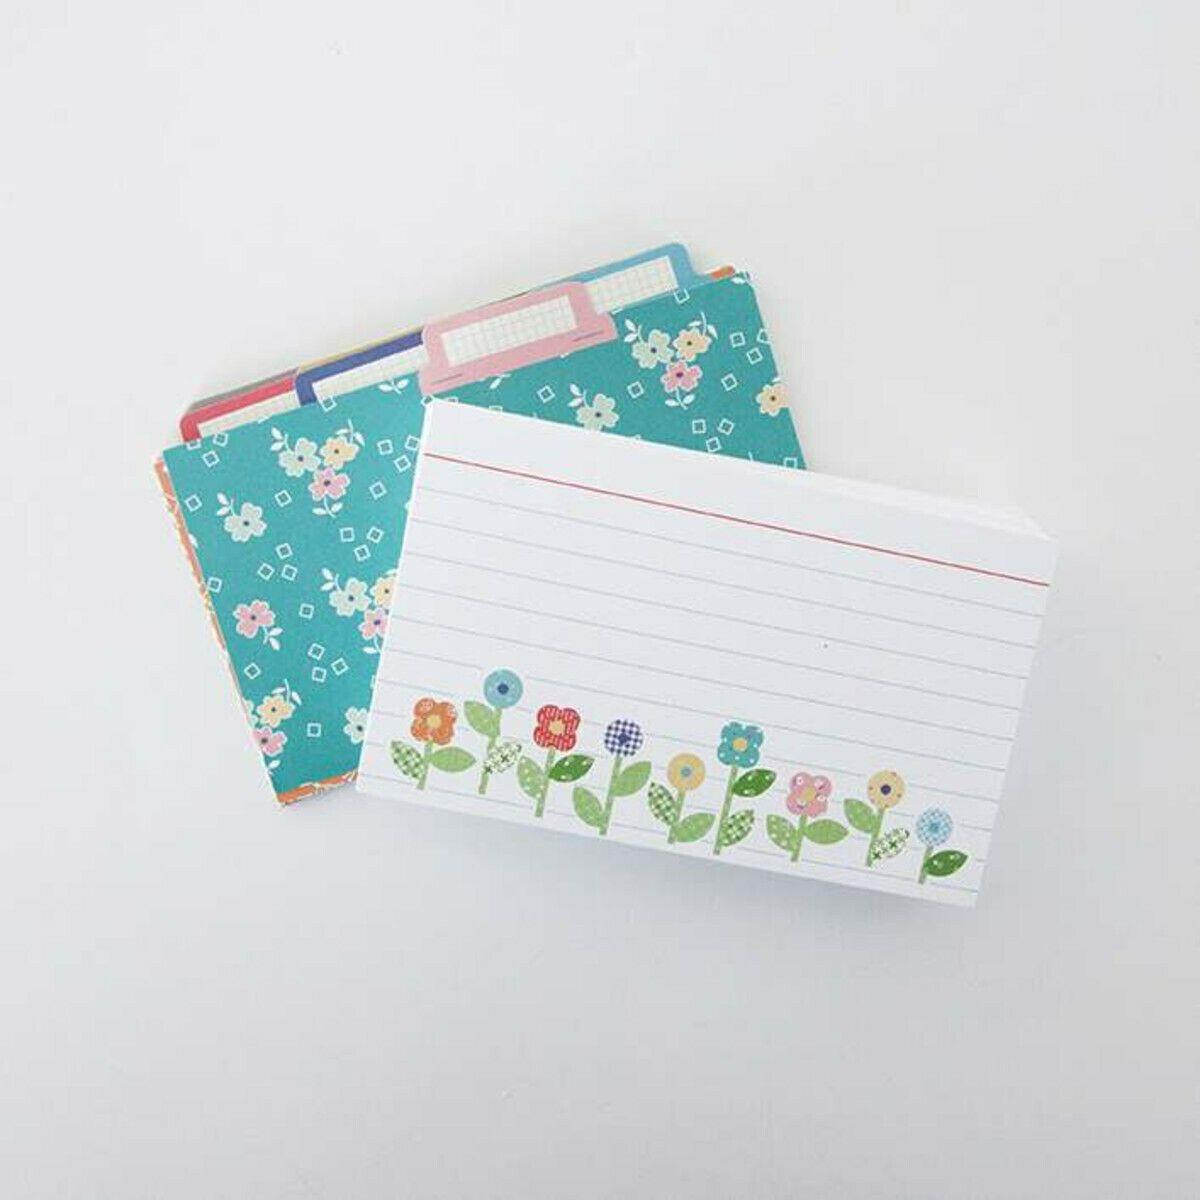 FARM GIRL VINTAGE RECIPE CARDS 3x5 72 cards by Lori Holt